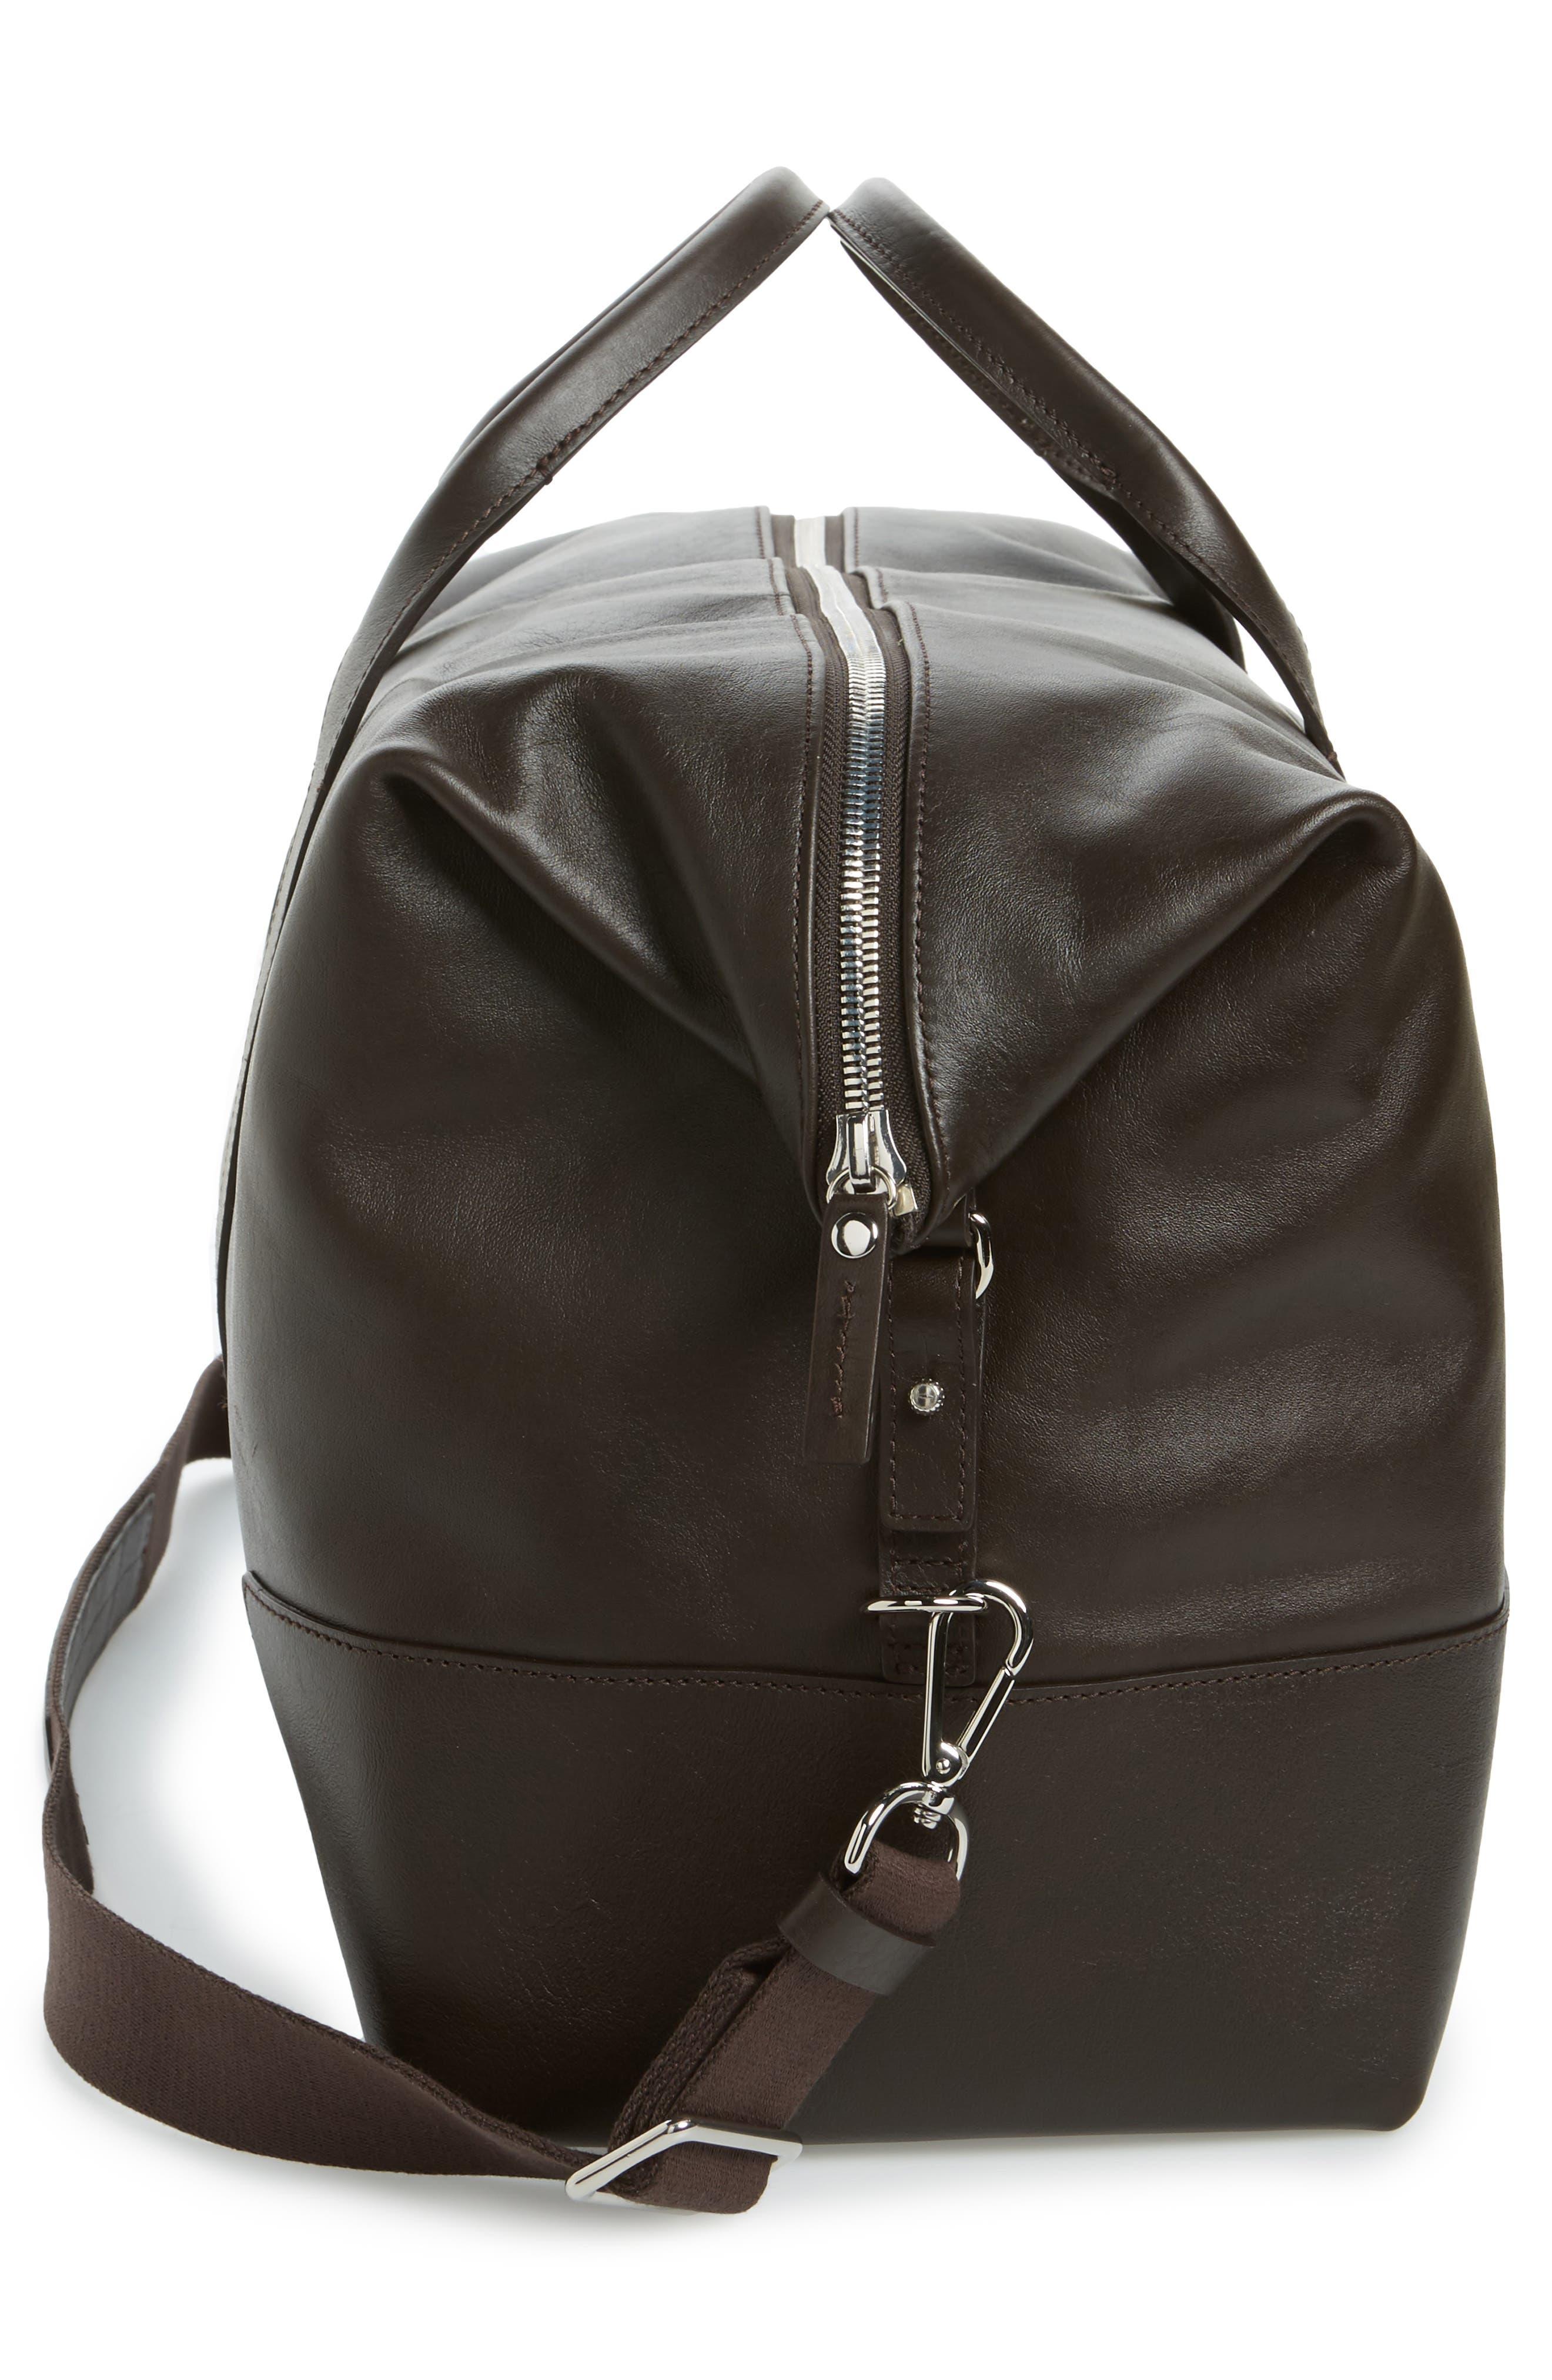 Signature Leather Duffel Bag,                             Alternate thumbnail 5, color,                             DEEP BROWN